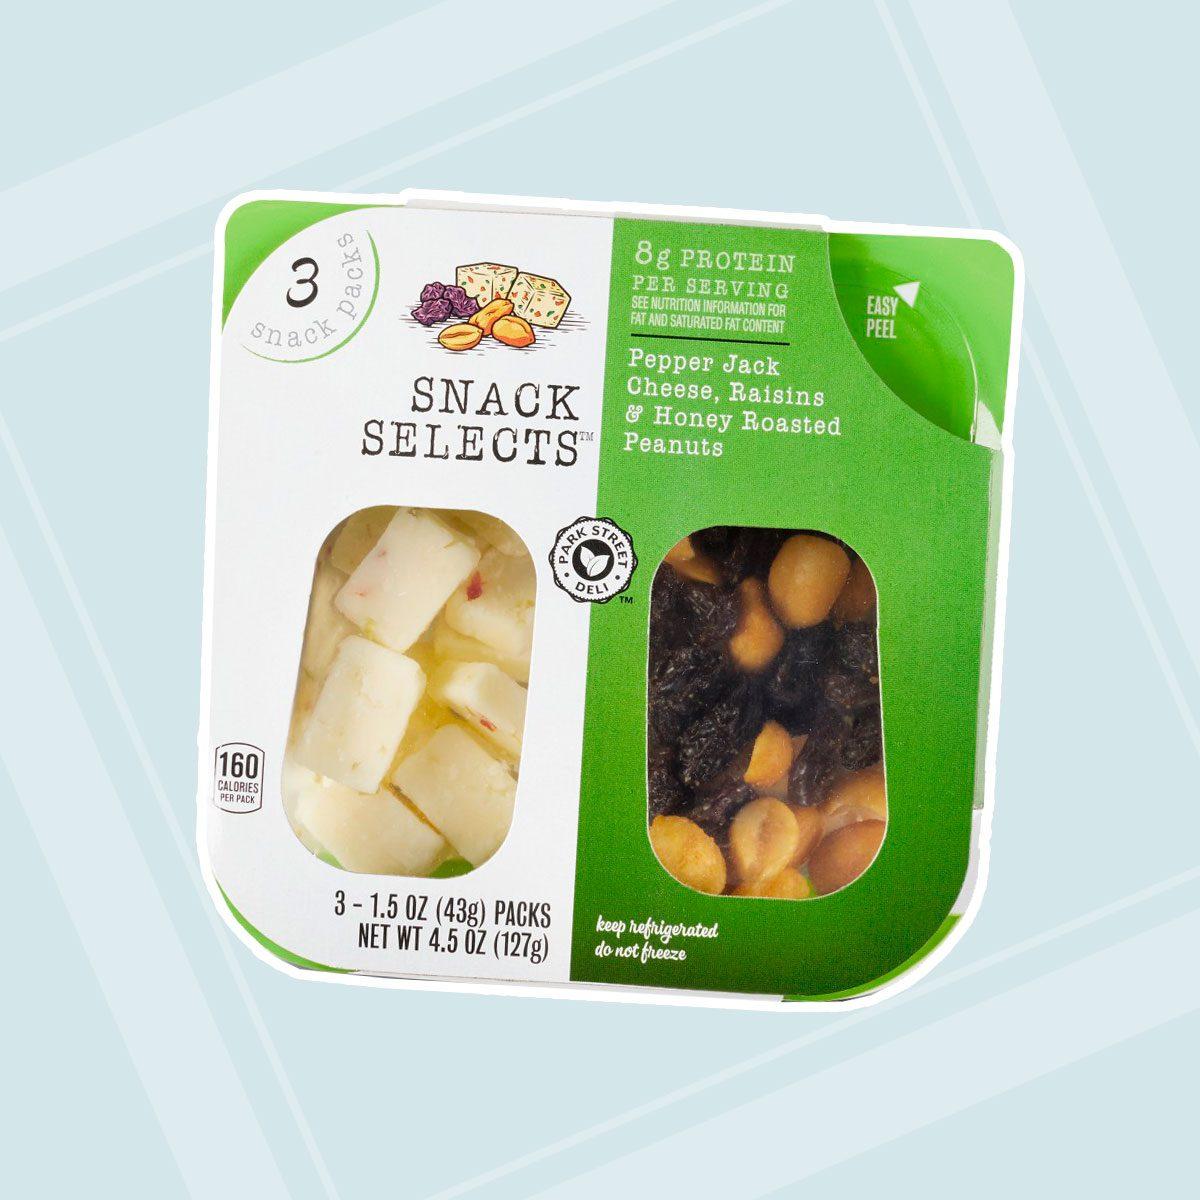 Park Street Deli Snack Selects